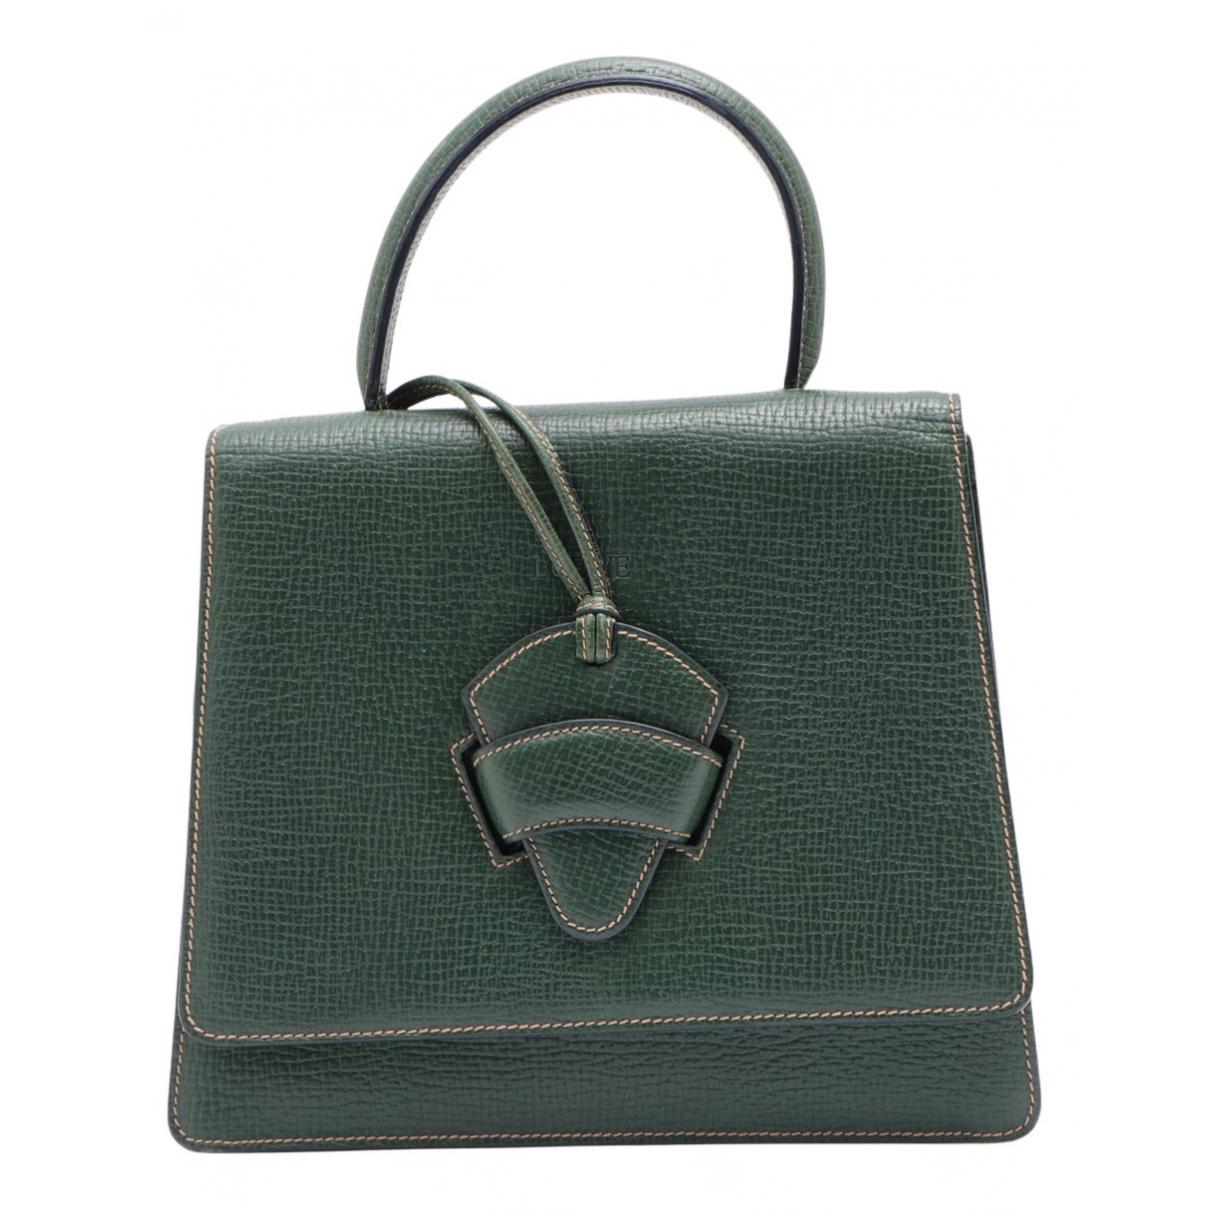 Loewe Barcelona Green Leather handbag for Women N